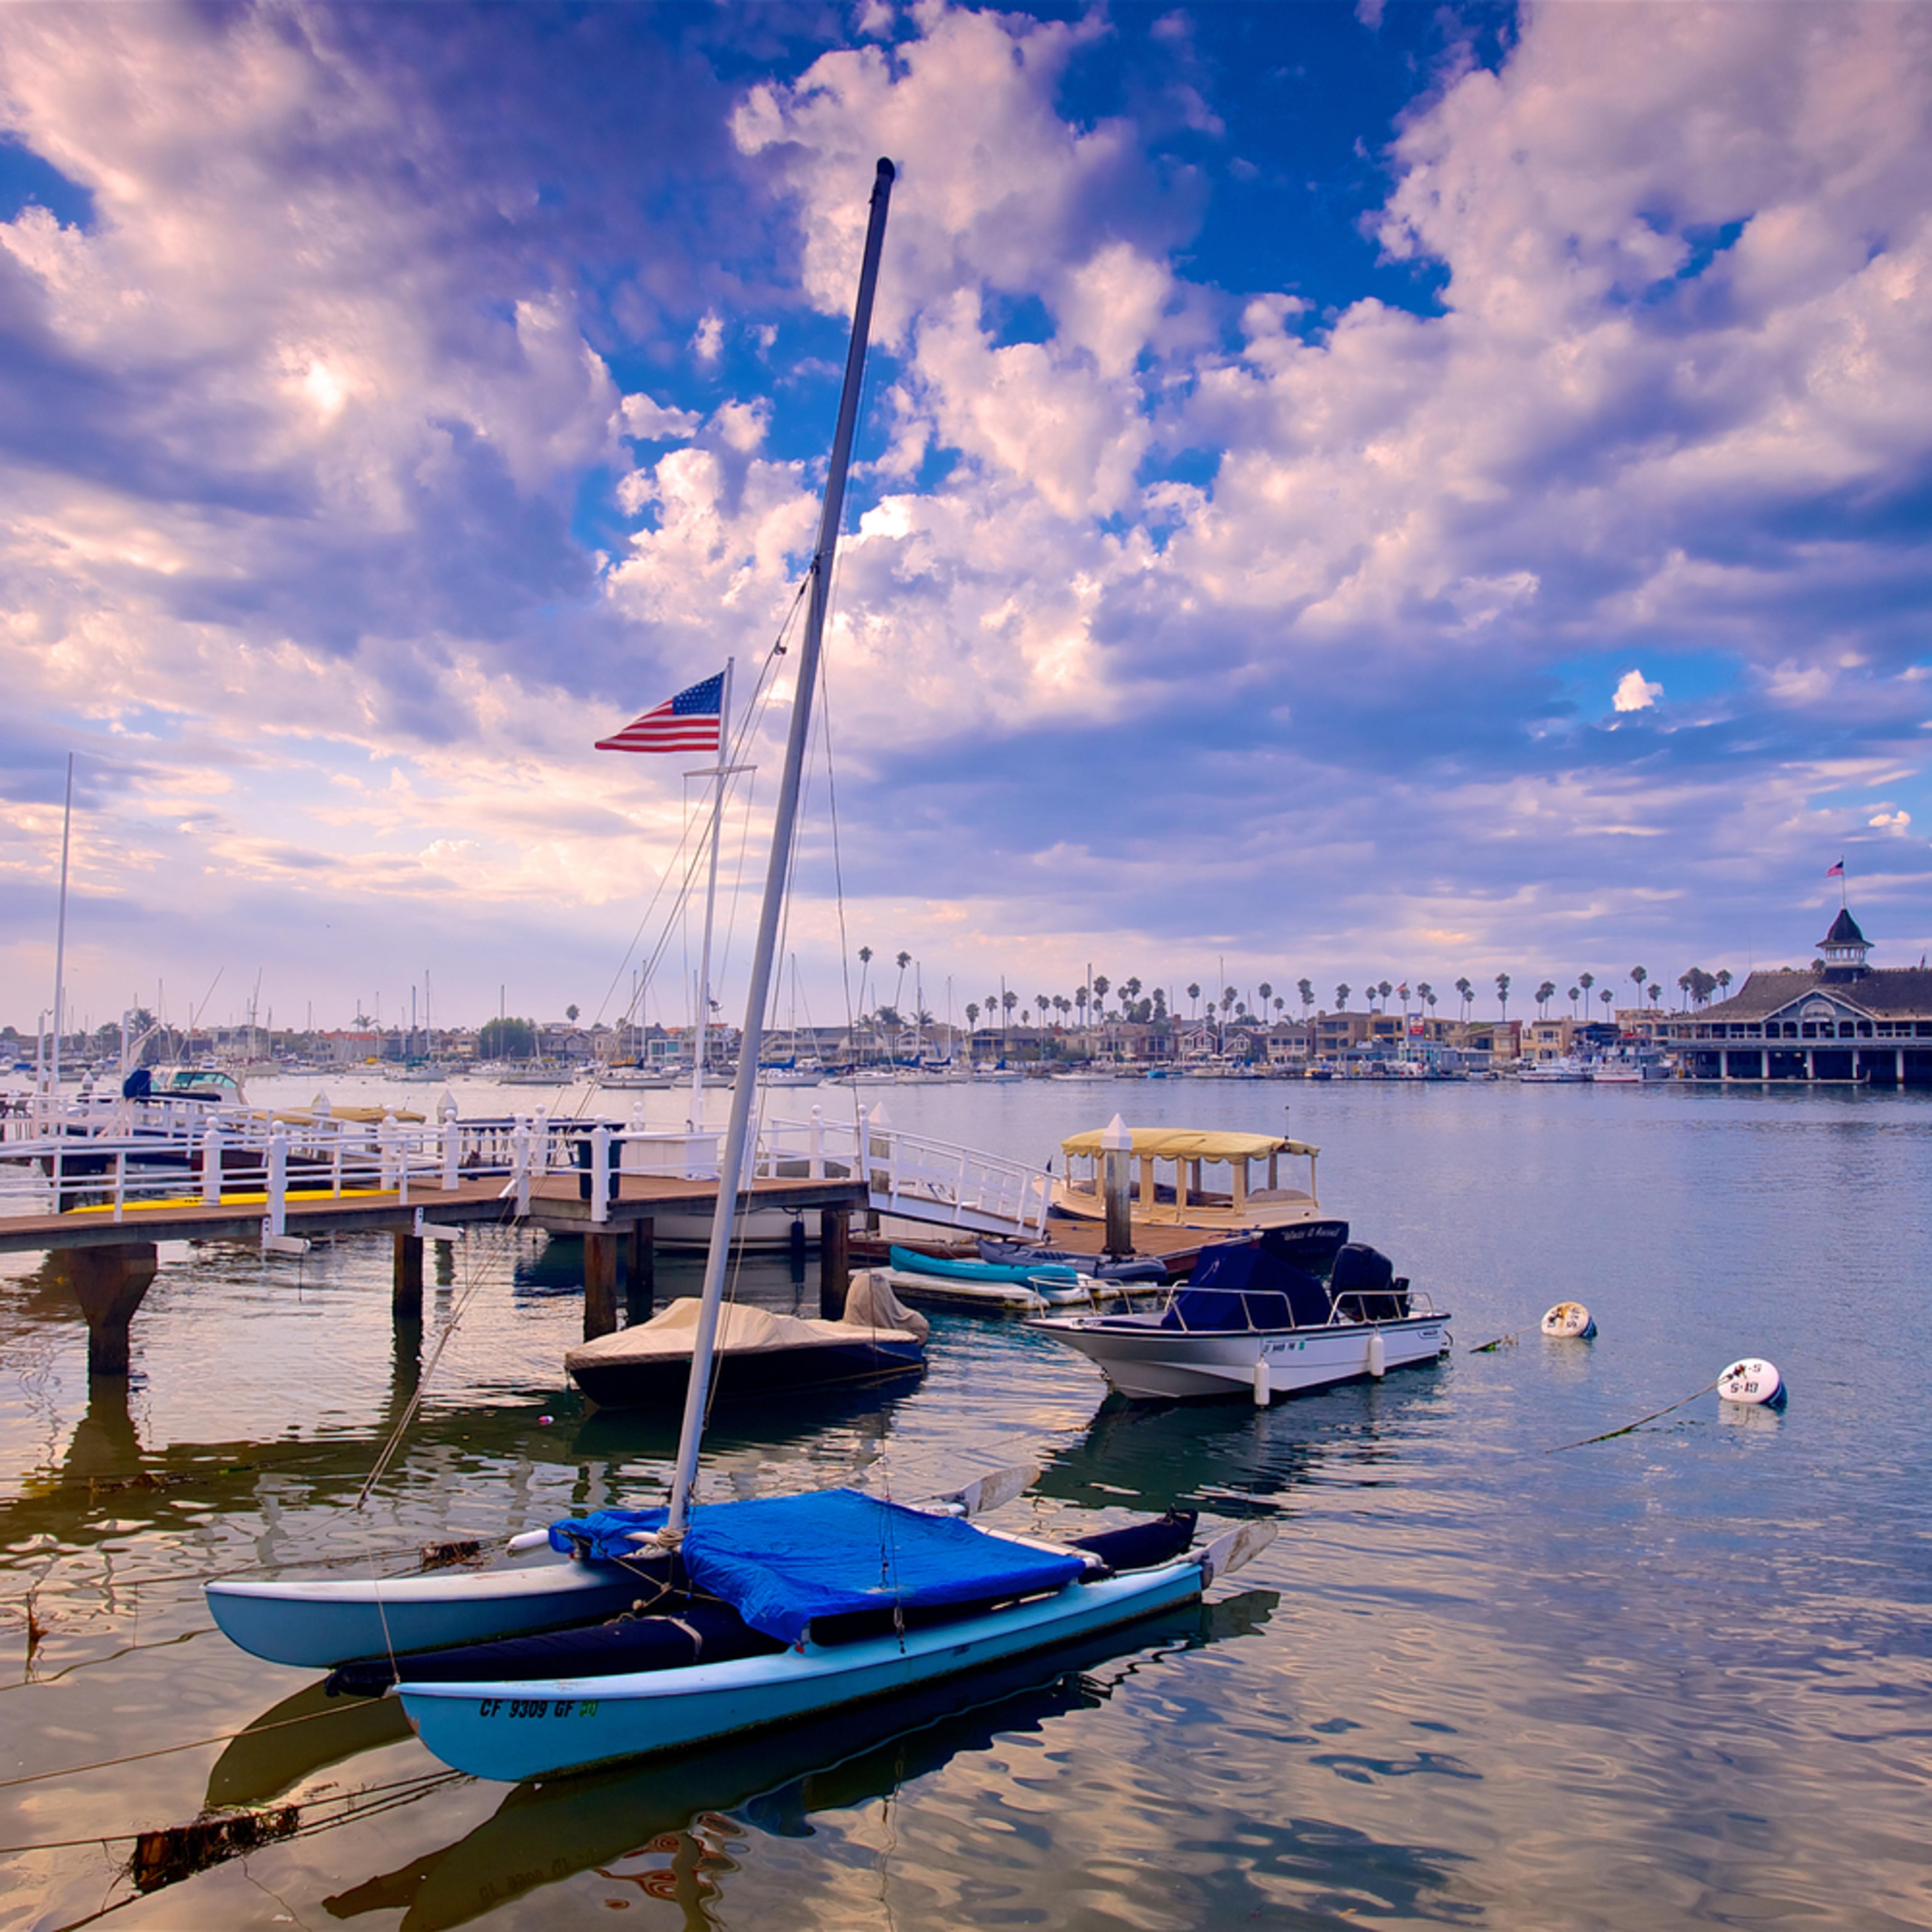 Balboa pavilion and boats lhmo93